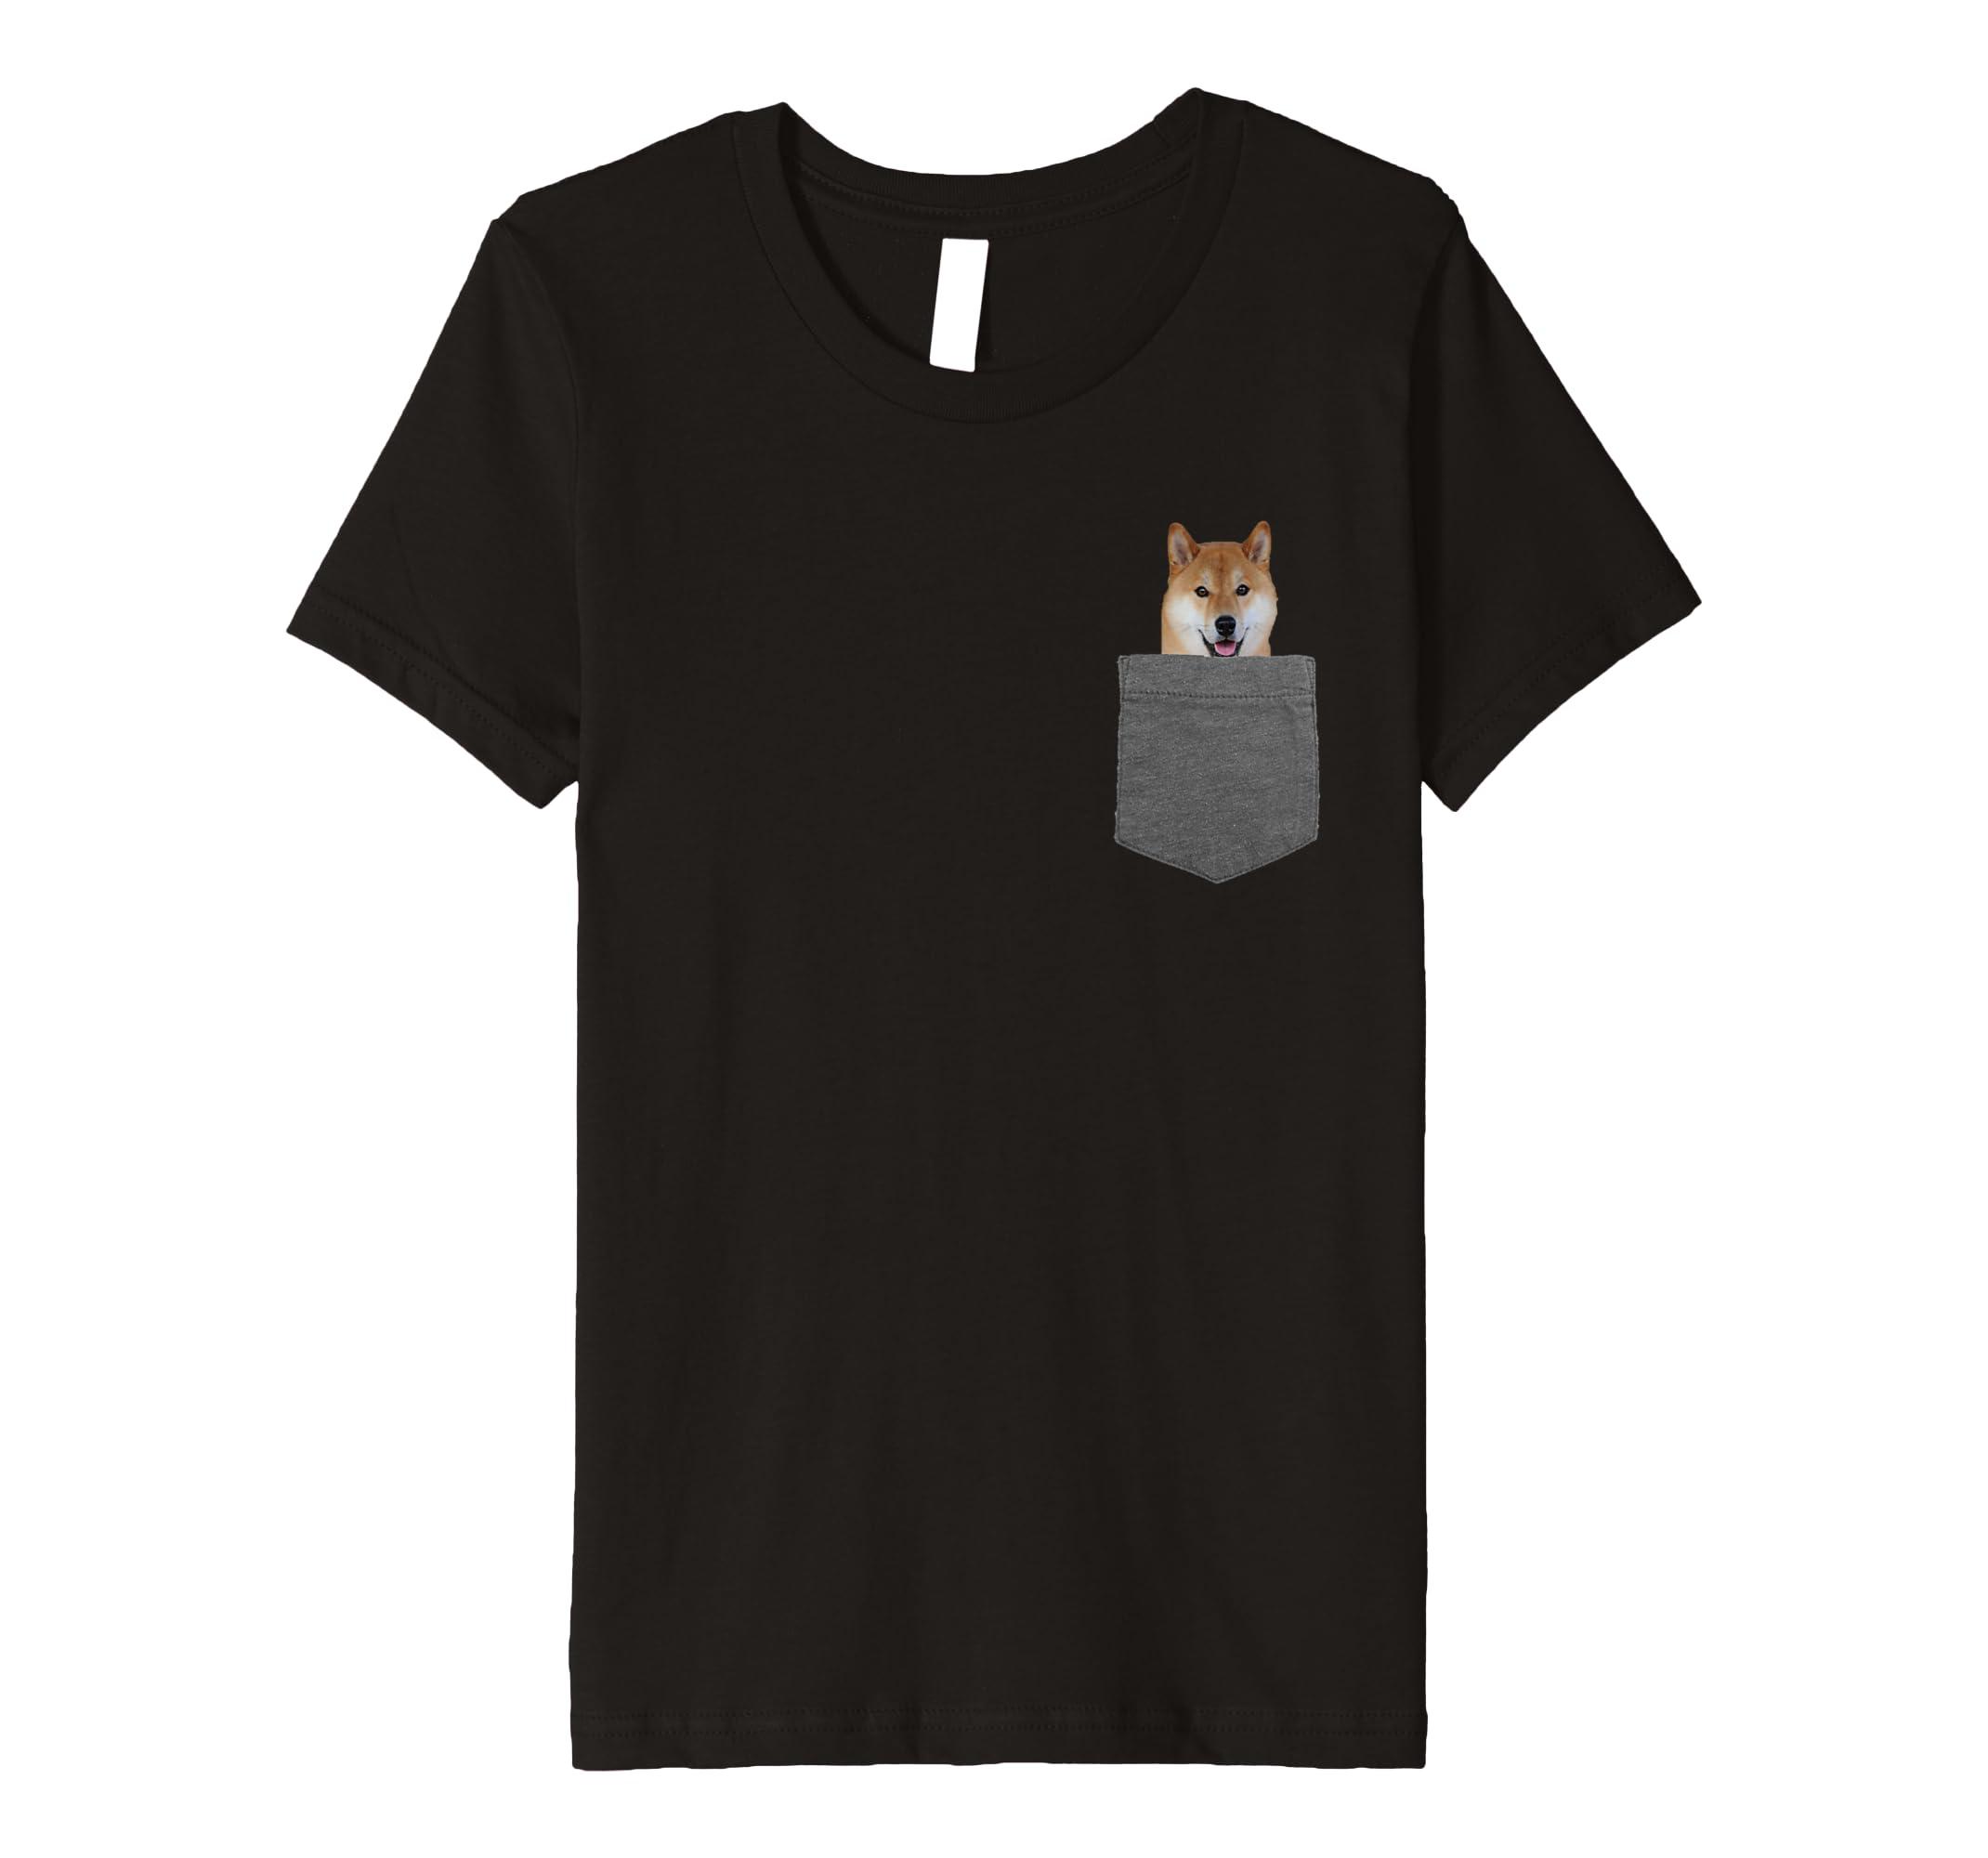 2ae40f2c936 Amazon.com  Dog in Your Pocket Tshirt Shiba Inu Shirt Doge Tee  Clothing